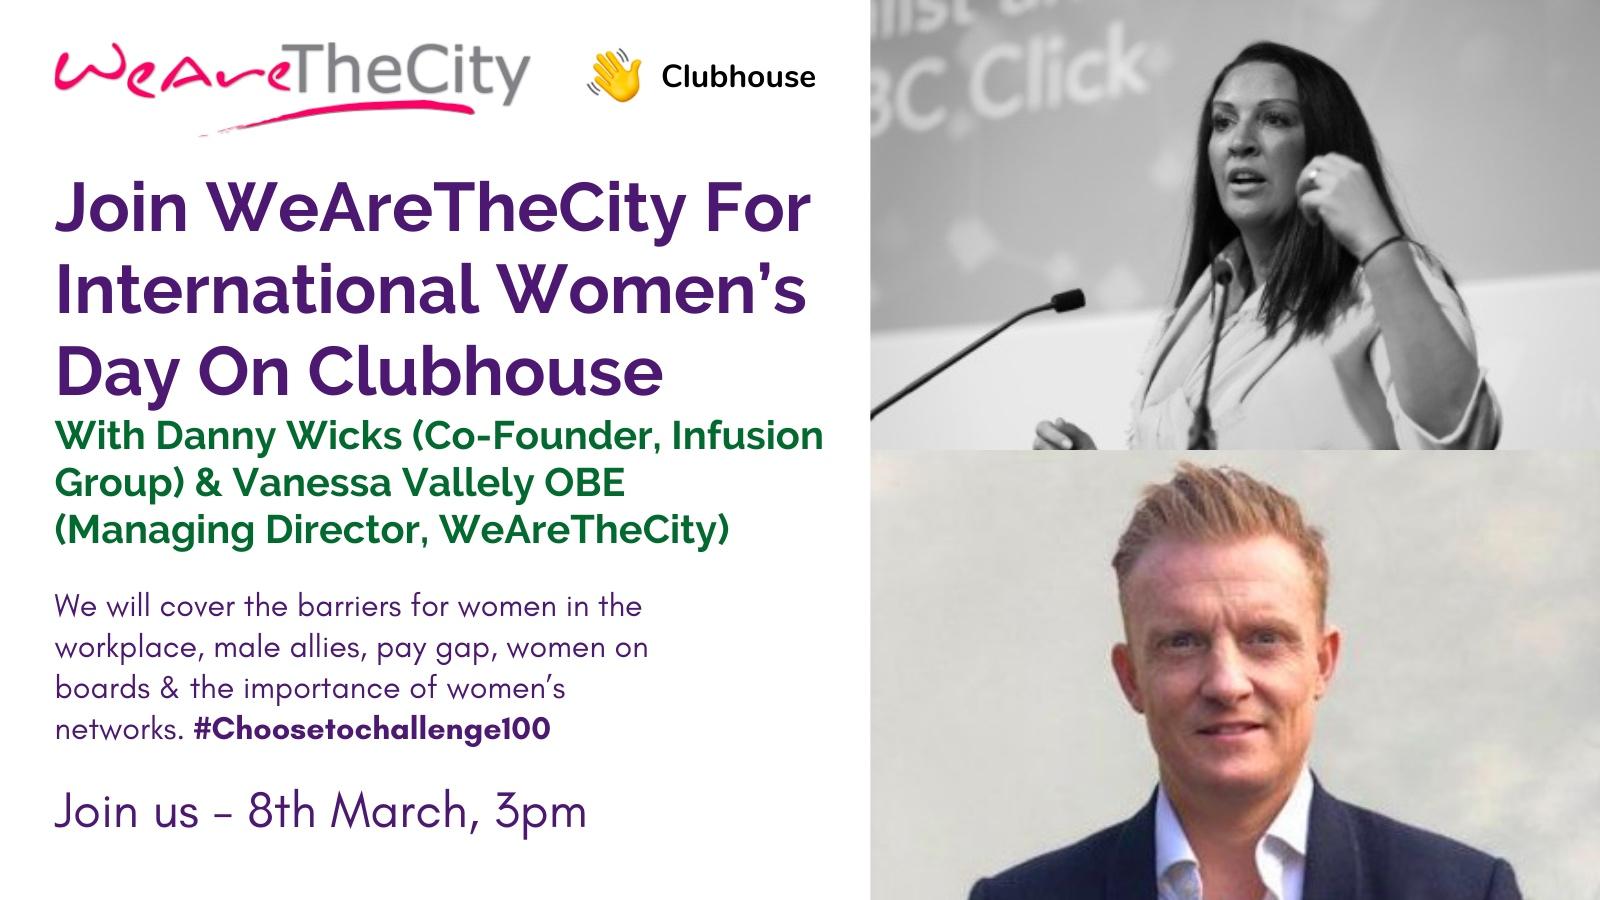 International Women's Day, Vanessa Vallely & Danny Wicks event